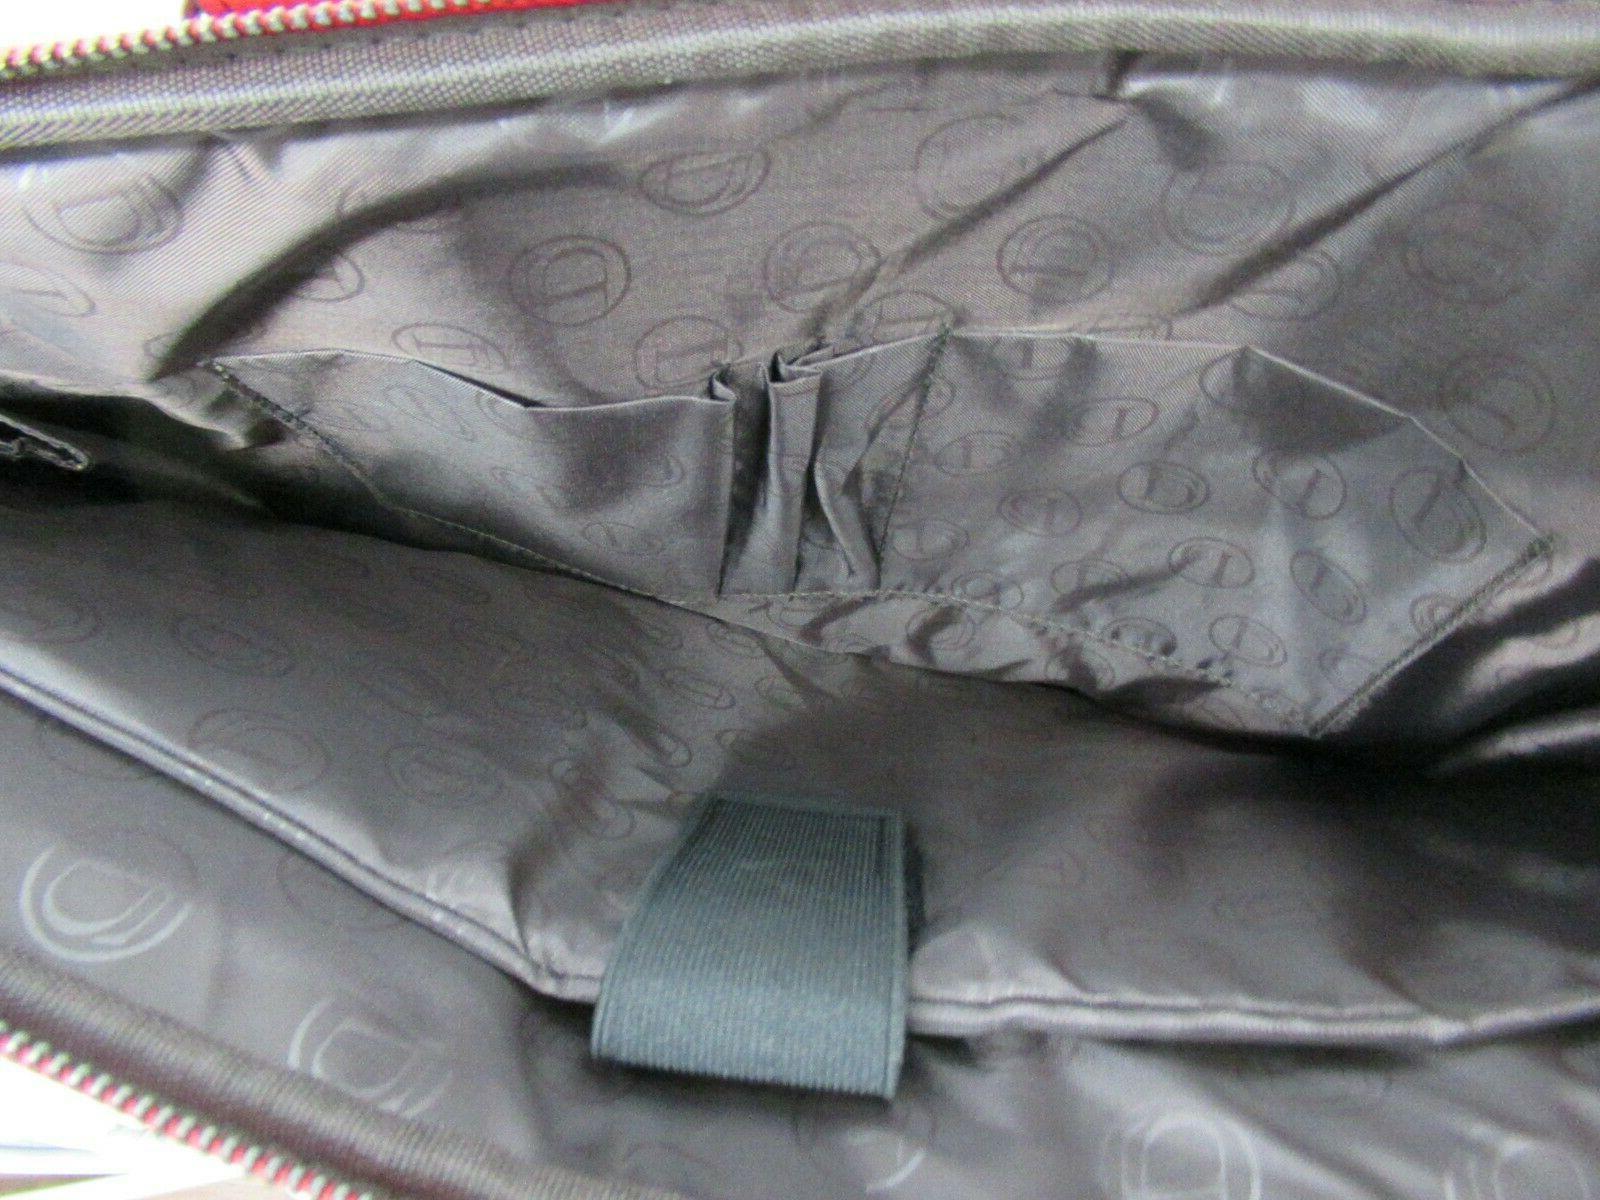 EDODAY 14-15.6 Inch Laptop Bag Women,Full Open Tote